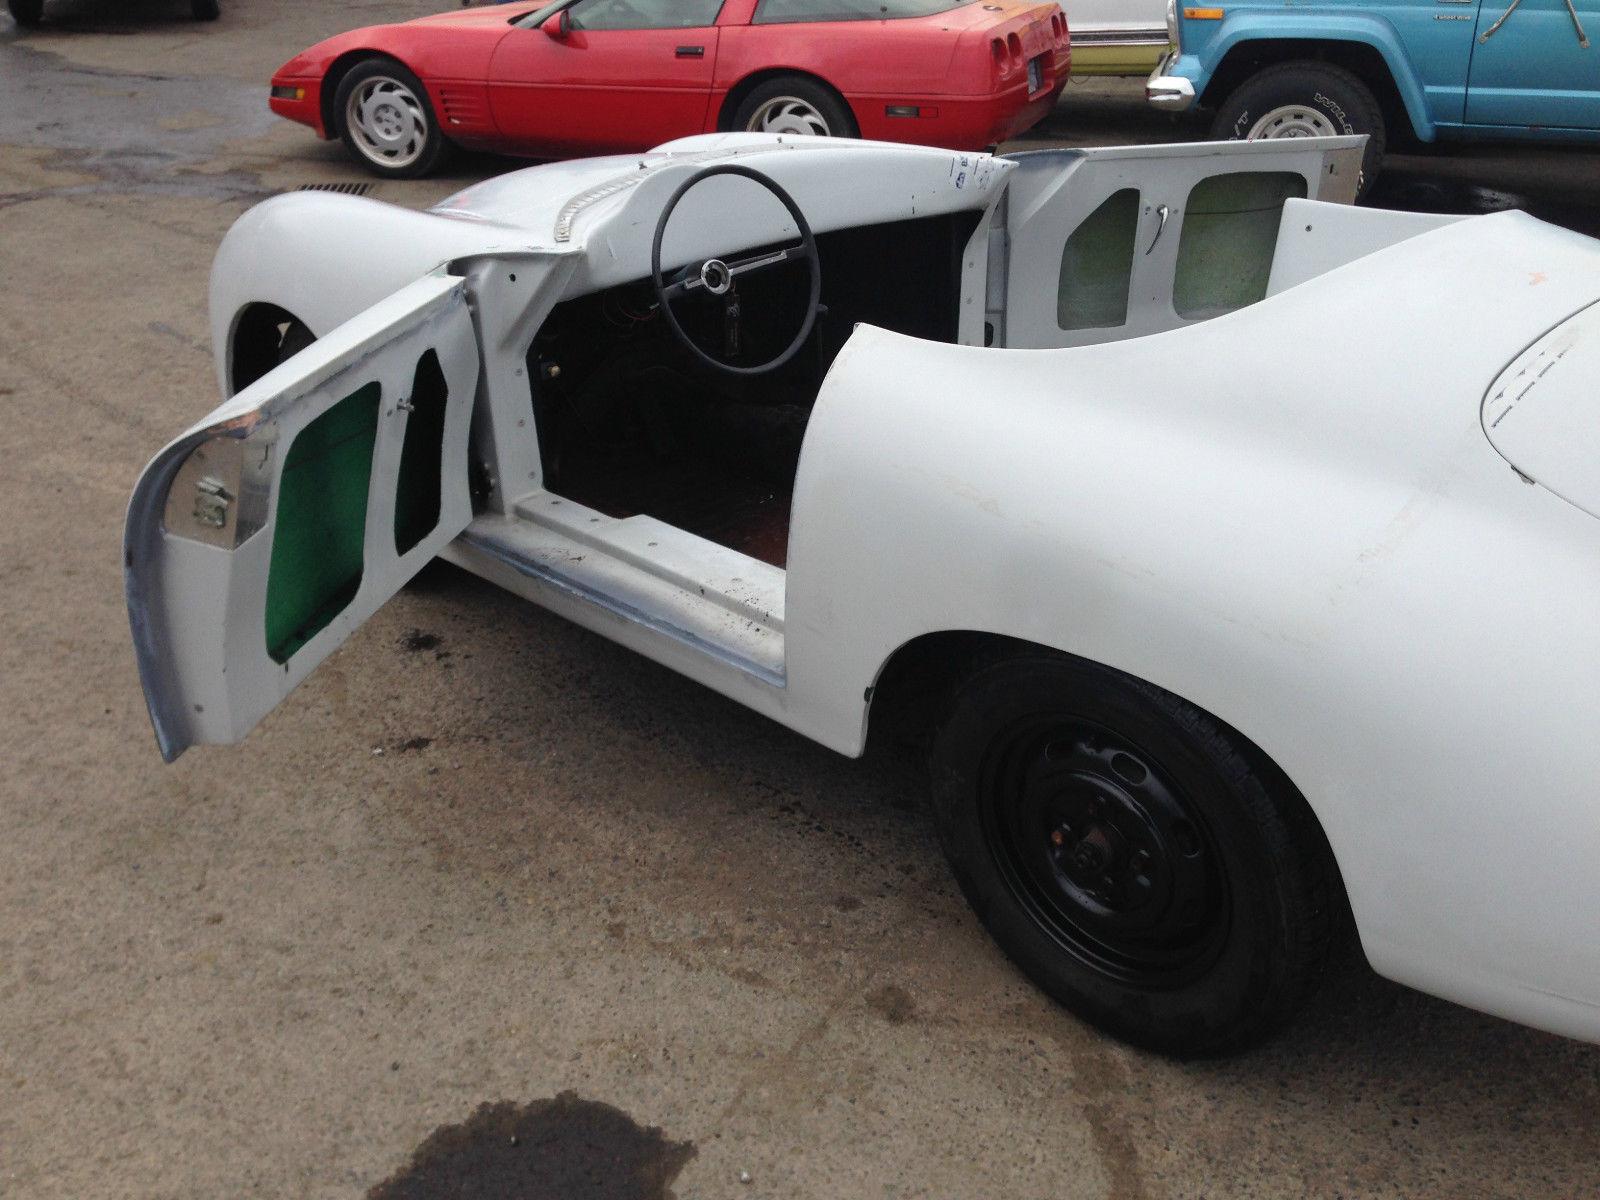 1956 356 porsche replica kit car classic porsche 356 1956 for sale. Black Bedroom Furniture Sets. Home Design Ideas